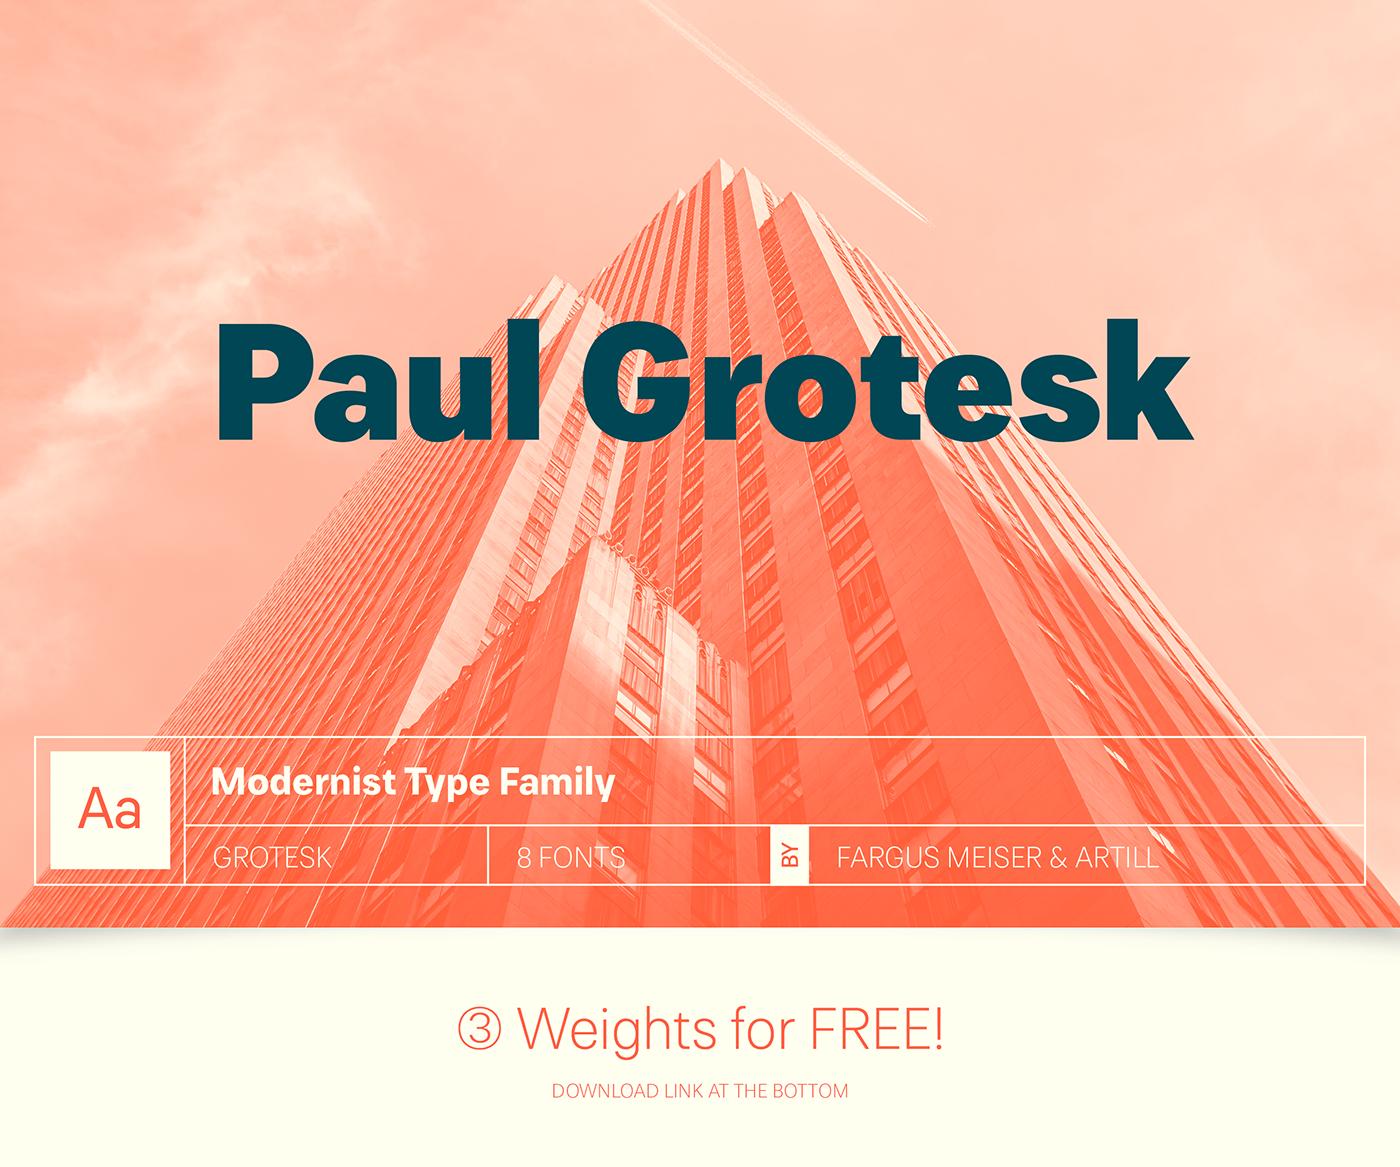 Paul Grotesk Typeface - Befonts com